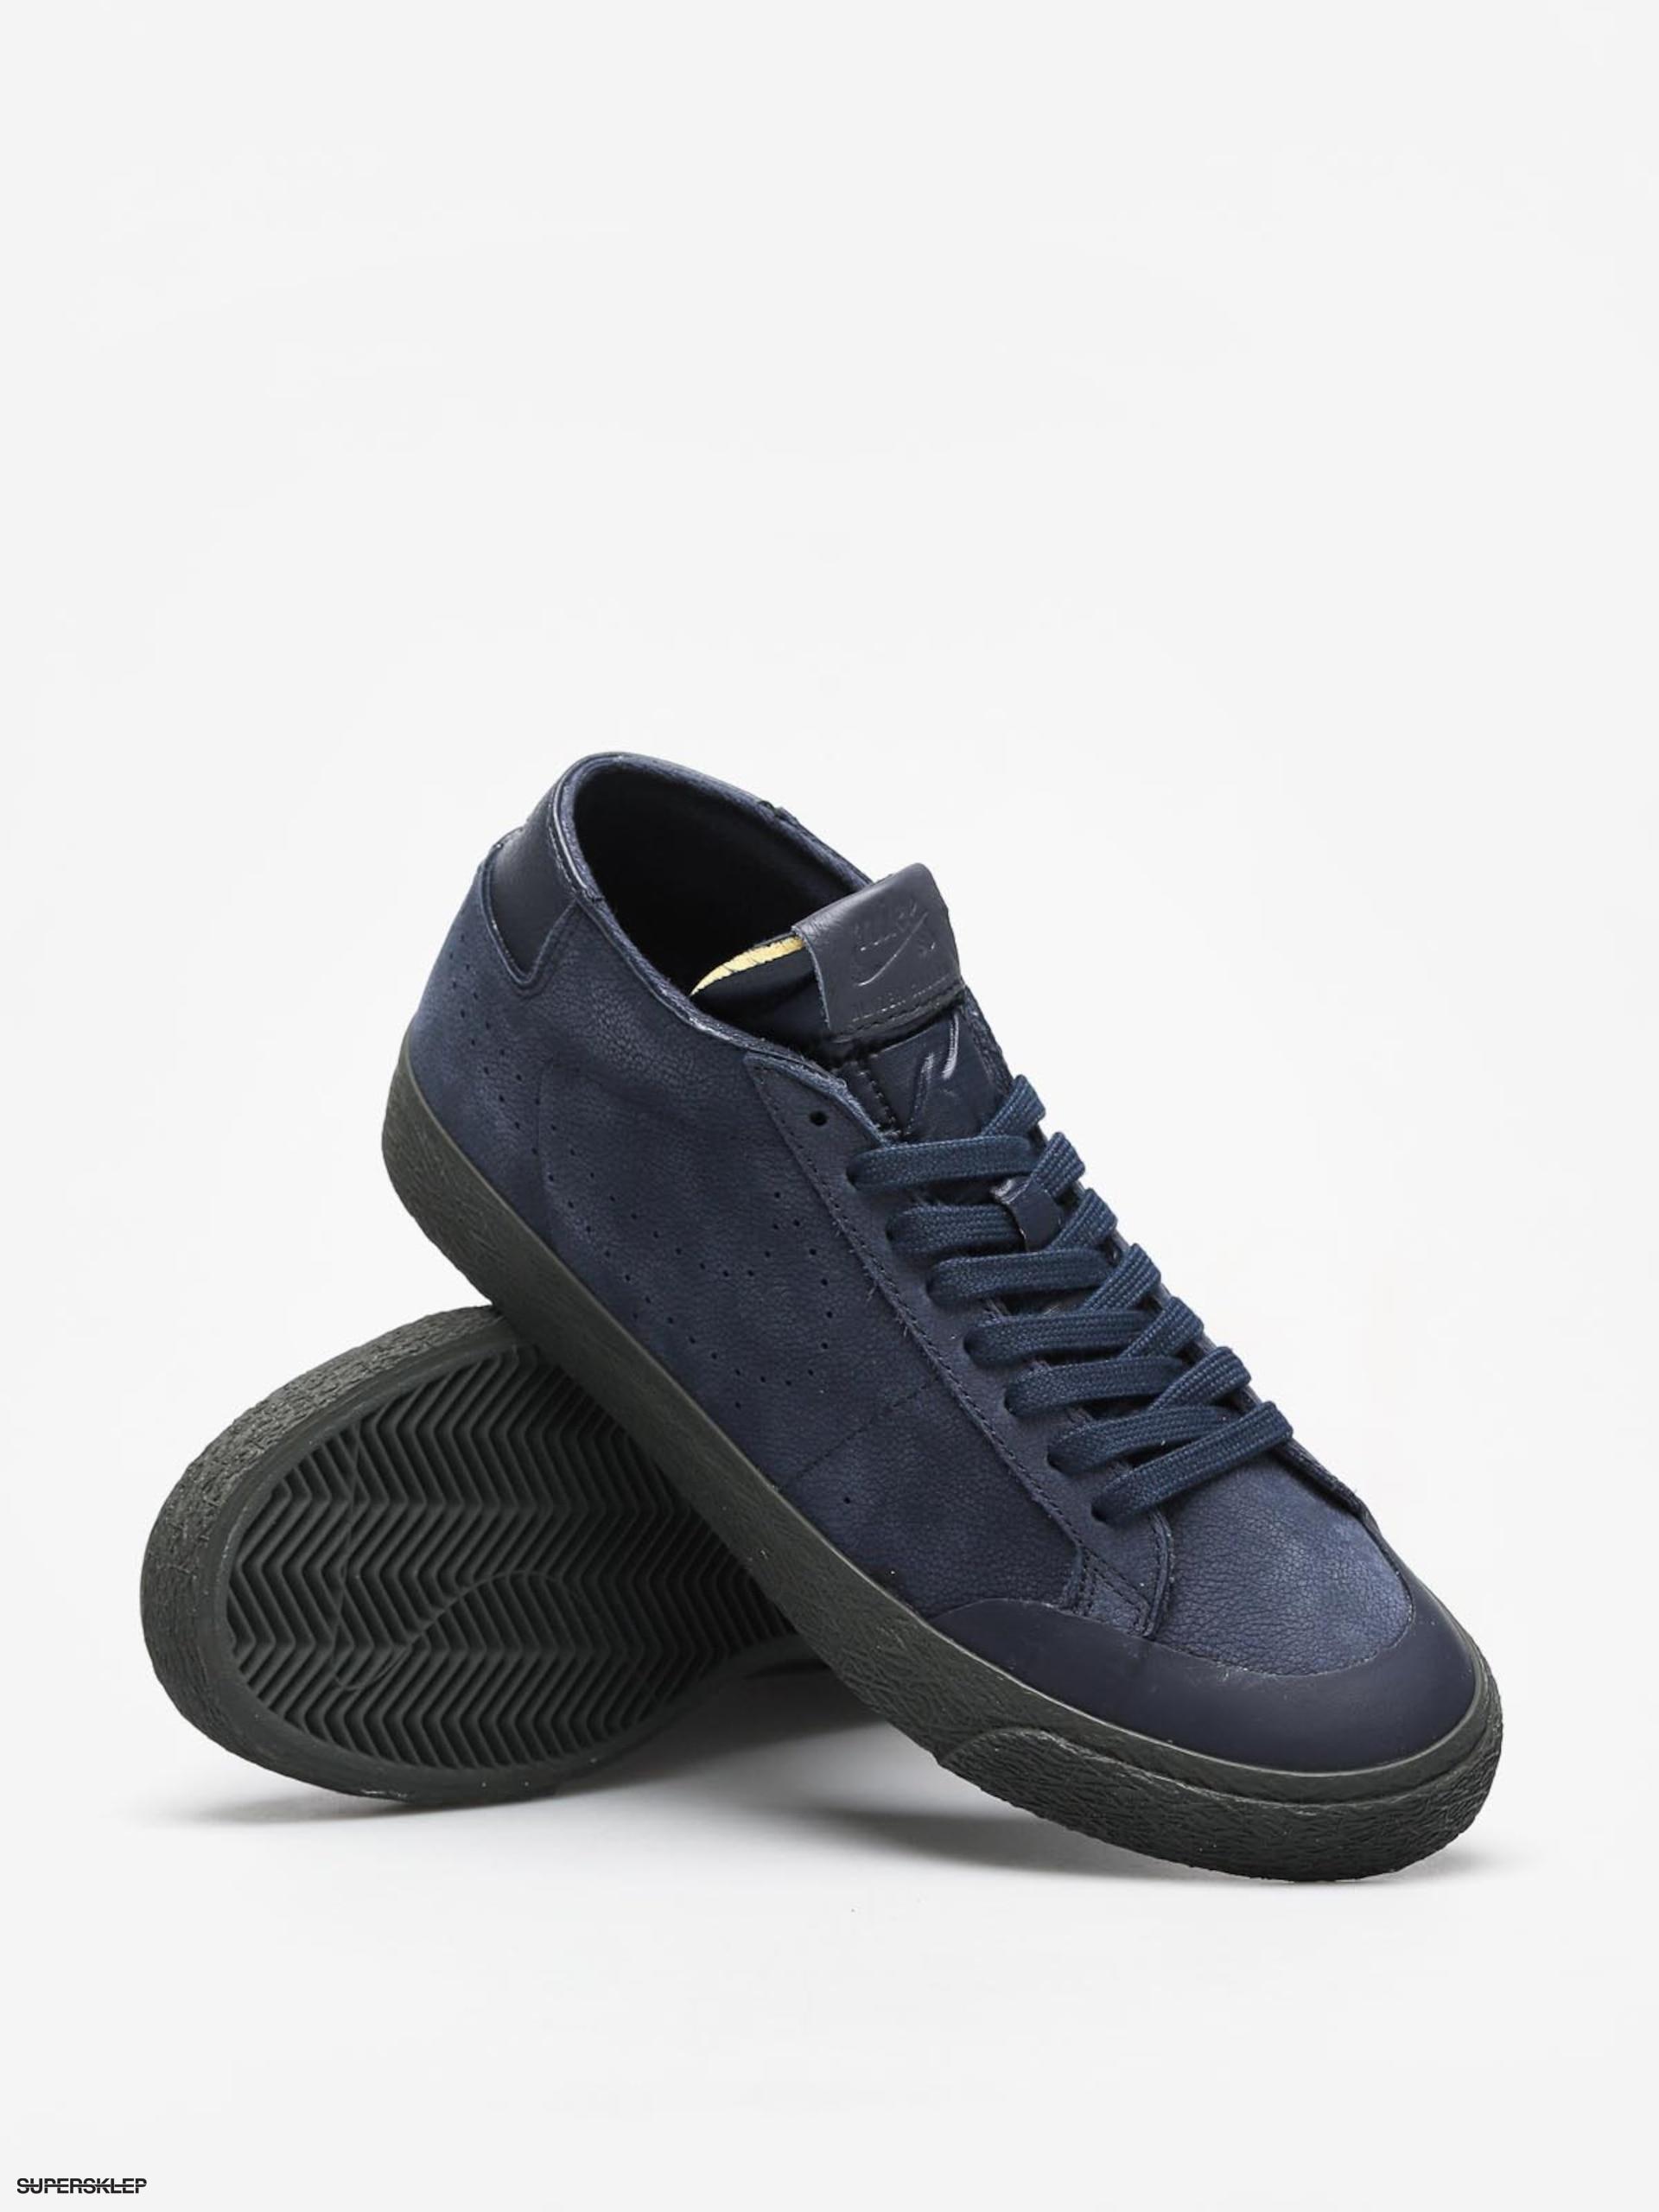 2207c76b5c5 Boty Nike SB Sb Zoom Blazer Chukka Xt Premium (obsidian obsidian)